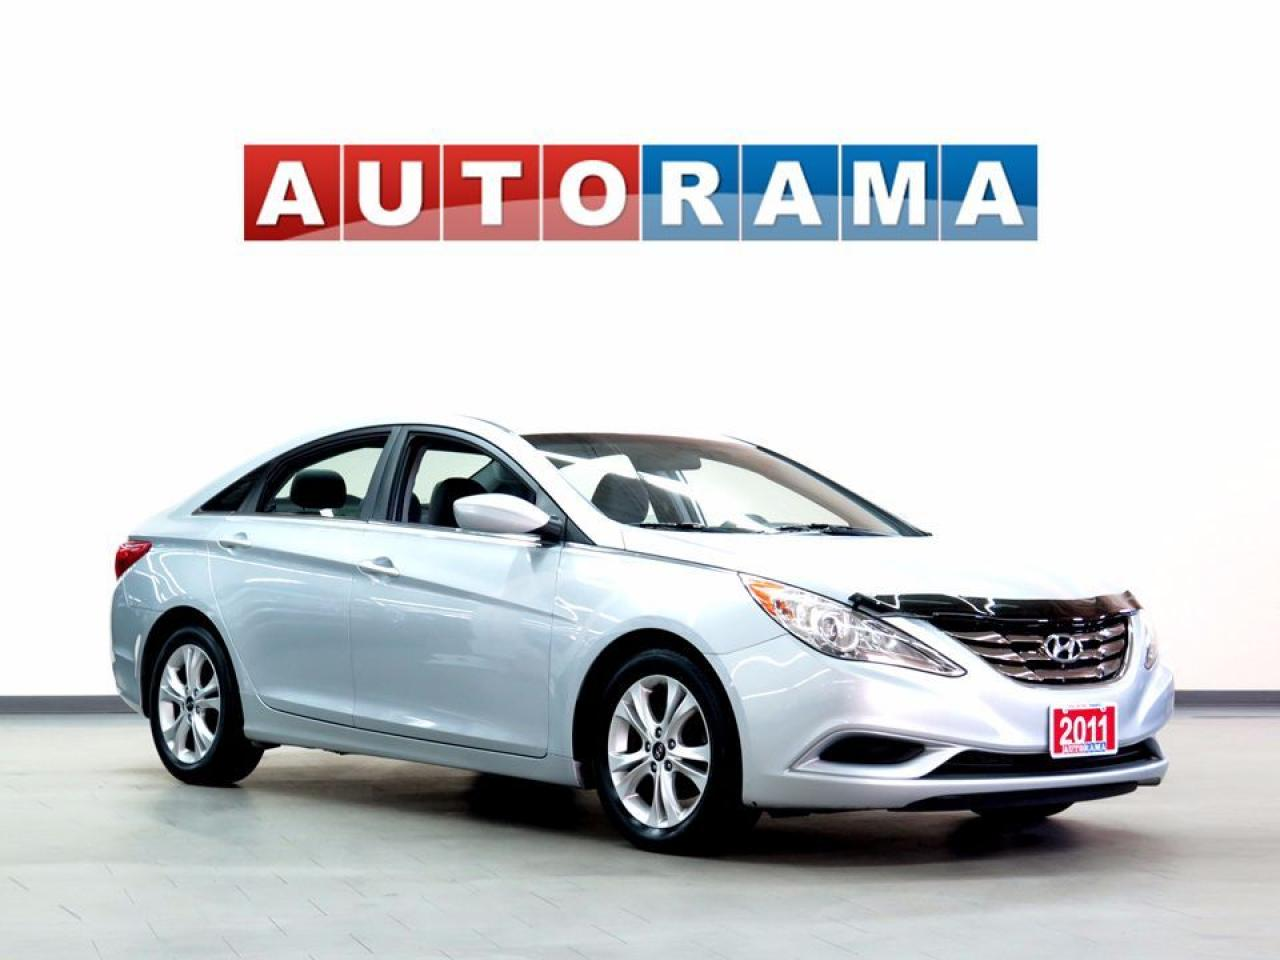 2011 Hyundai Sonata Heated Seats Bluetooth